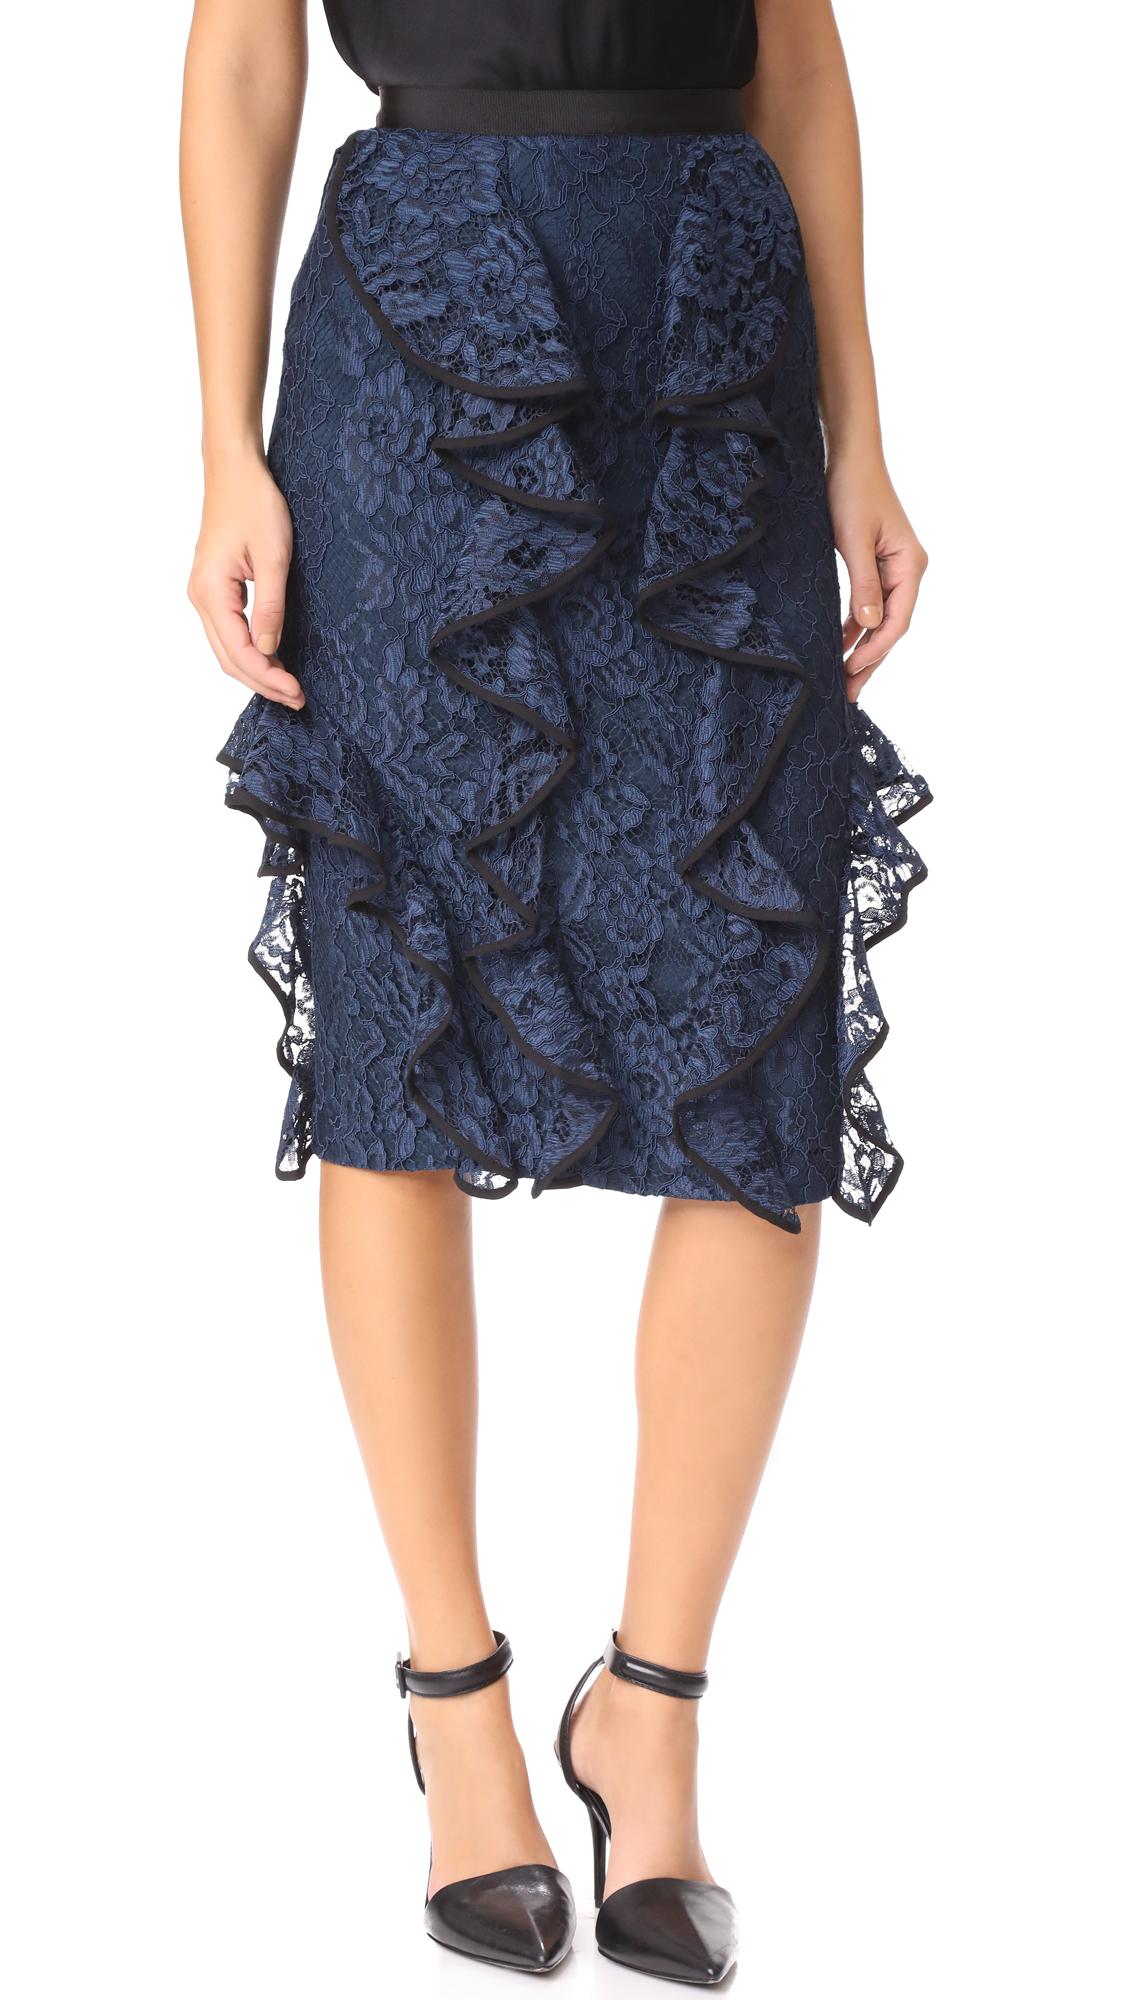 Alexis Jensine Lace Skirt - Navy Lace